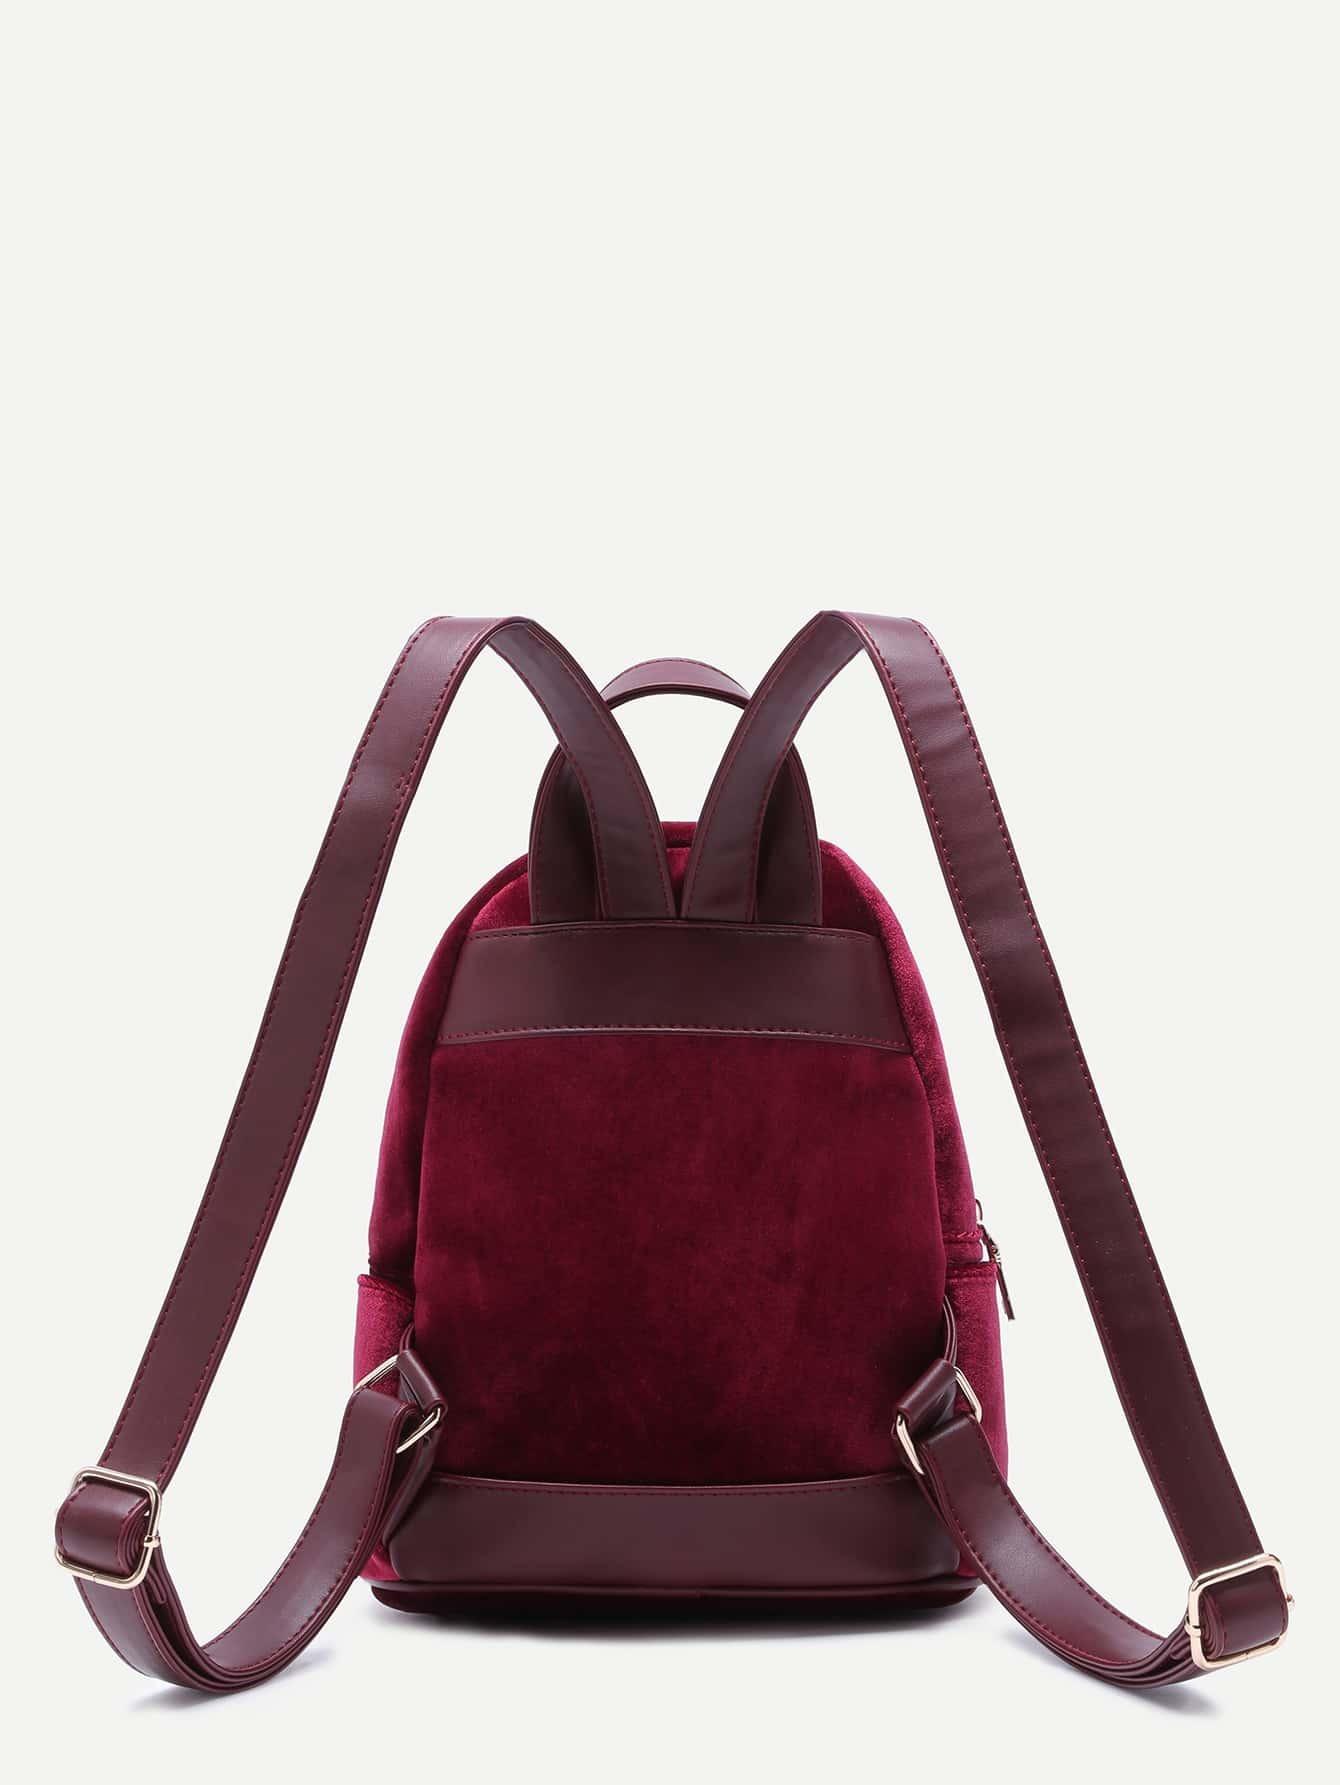 bag161020920_1